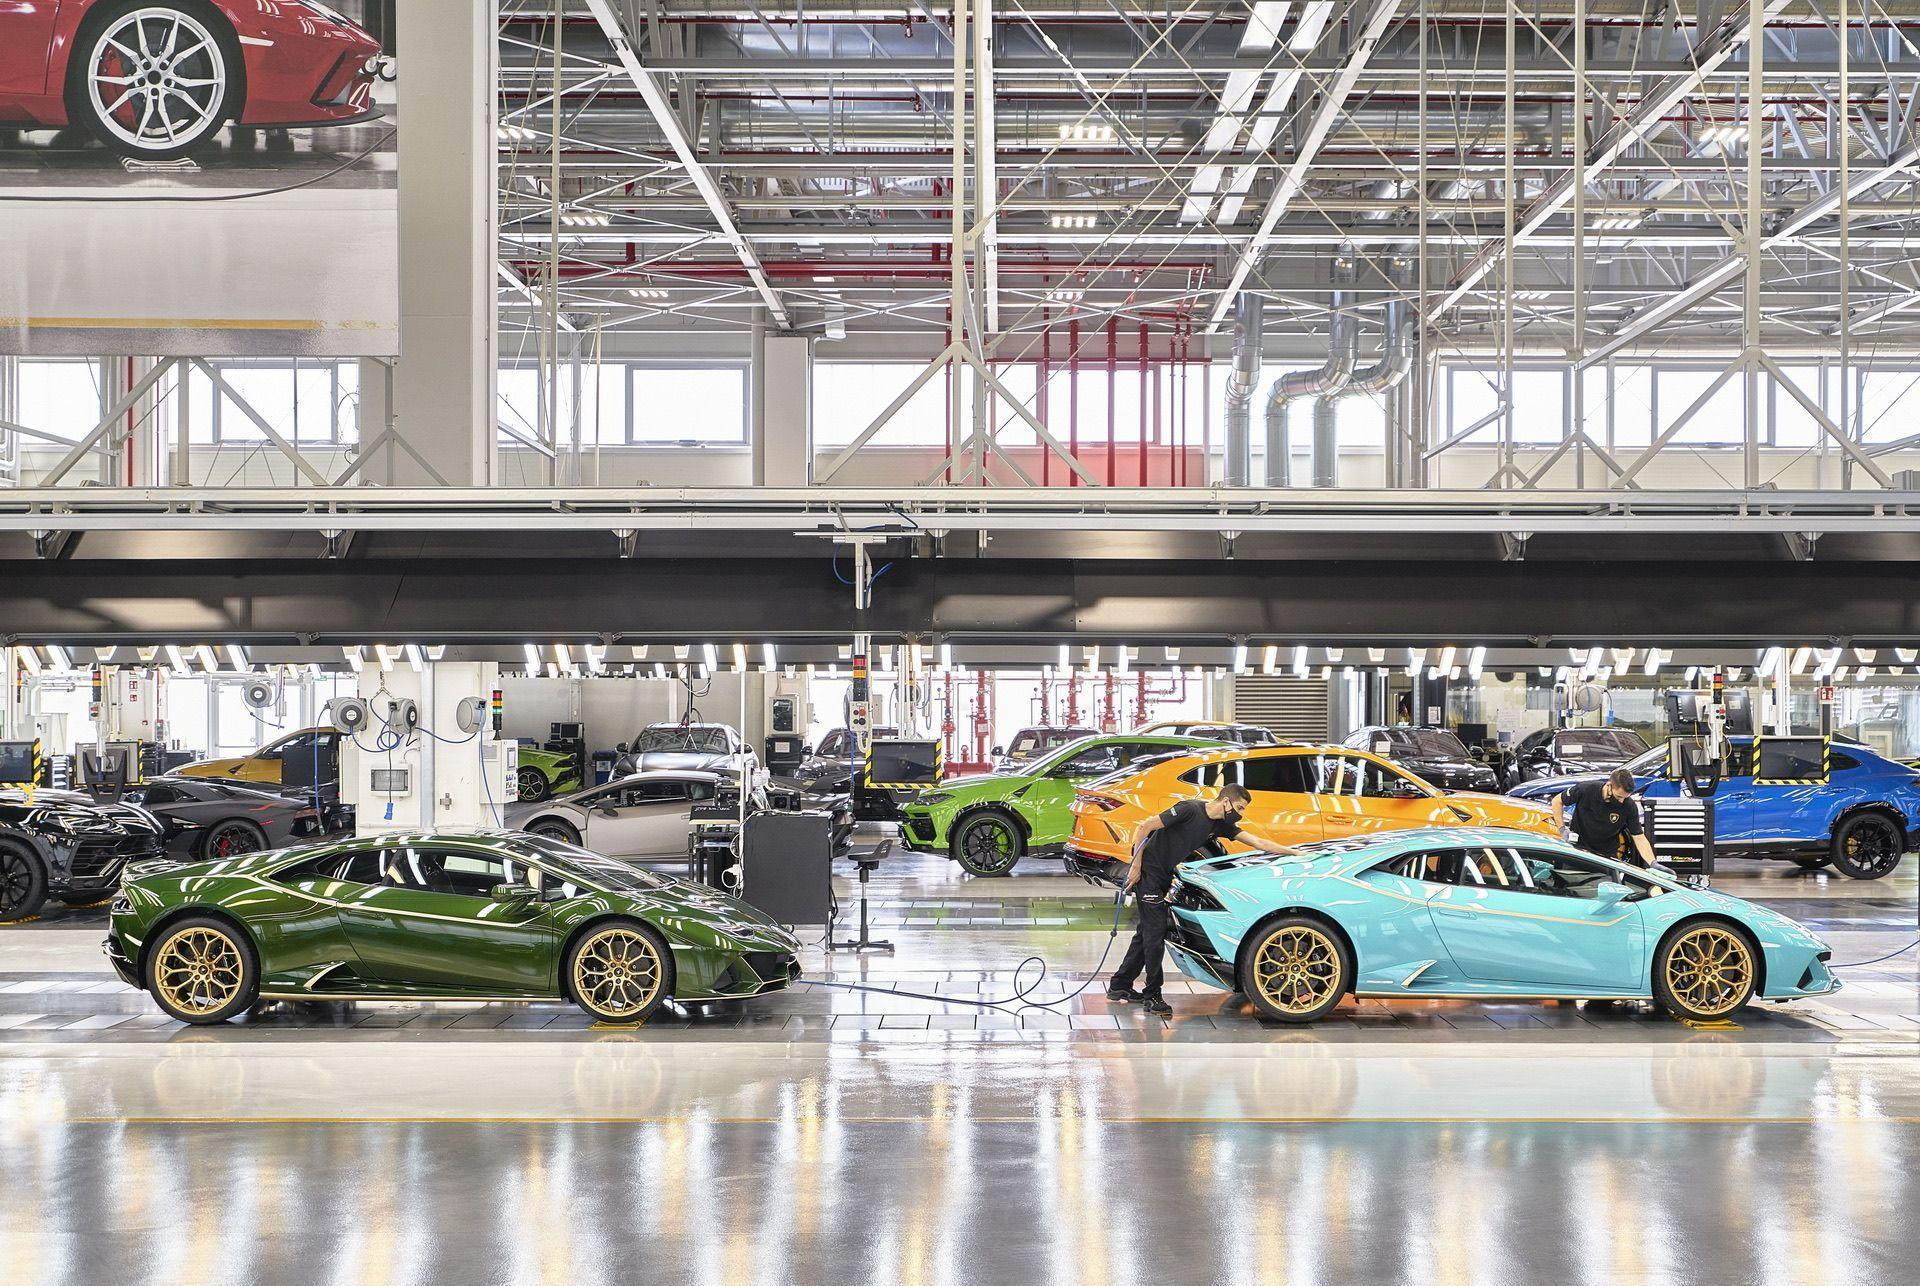 Lamborghini-Huracan-for-Mexico20_1920x1286